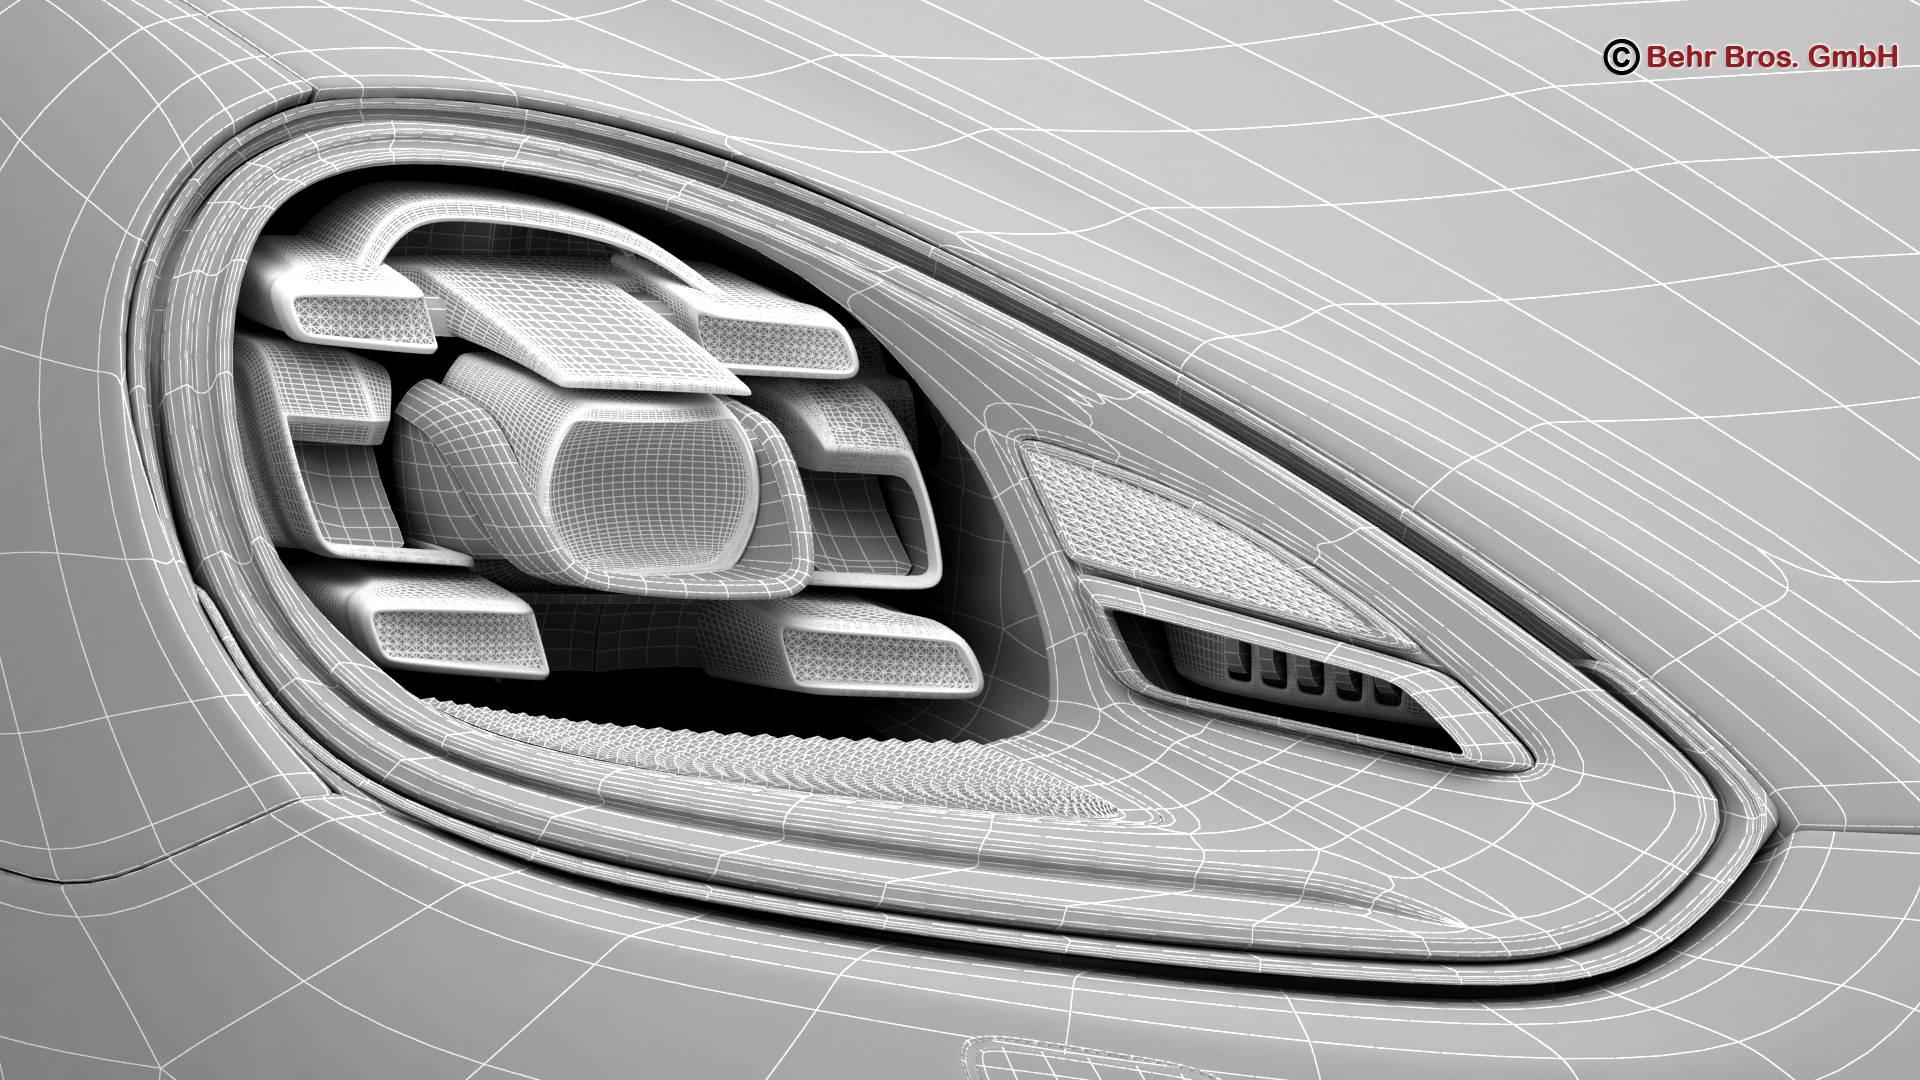 porsche cayenne turbo s 2016 3d model 3ds max fbx c4d lwo ma mb obj 214950